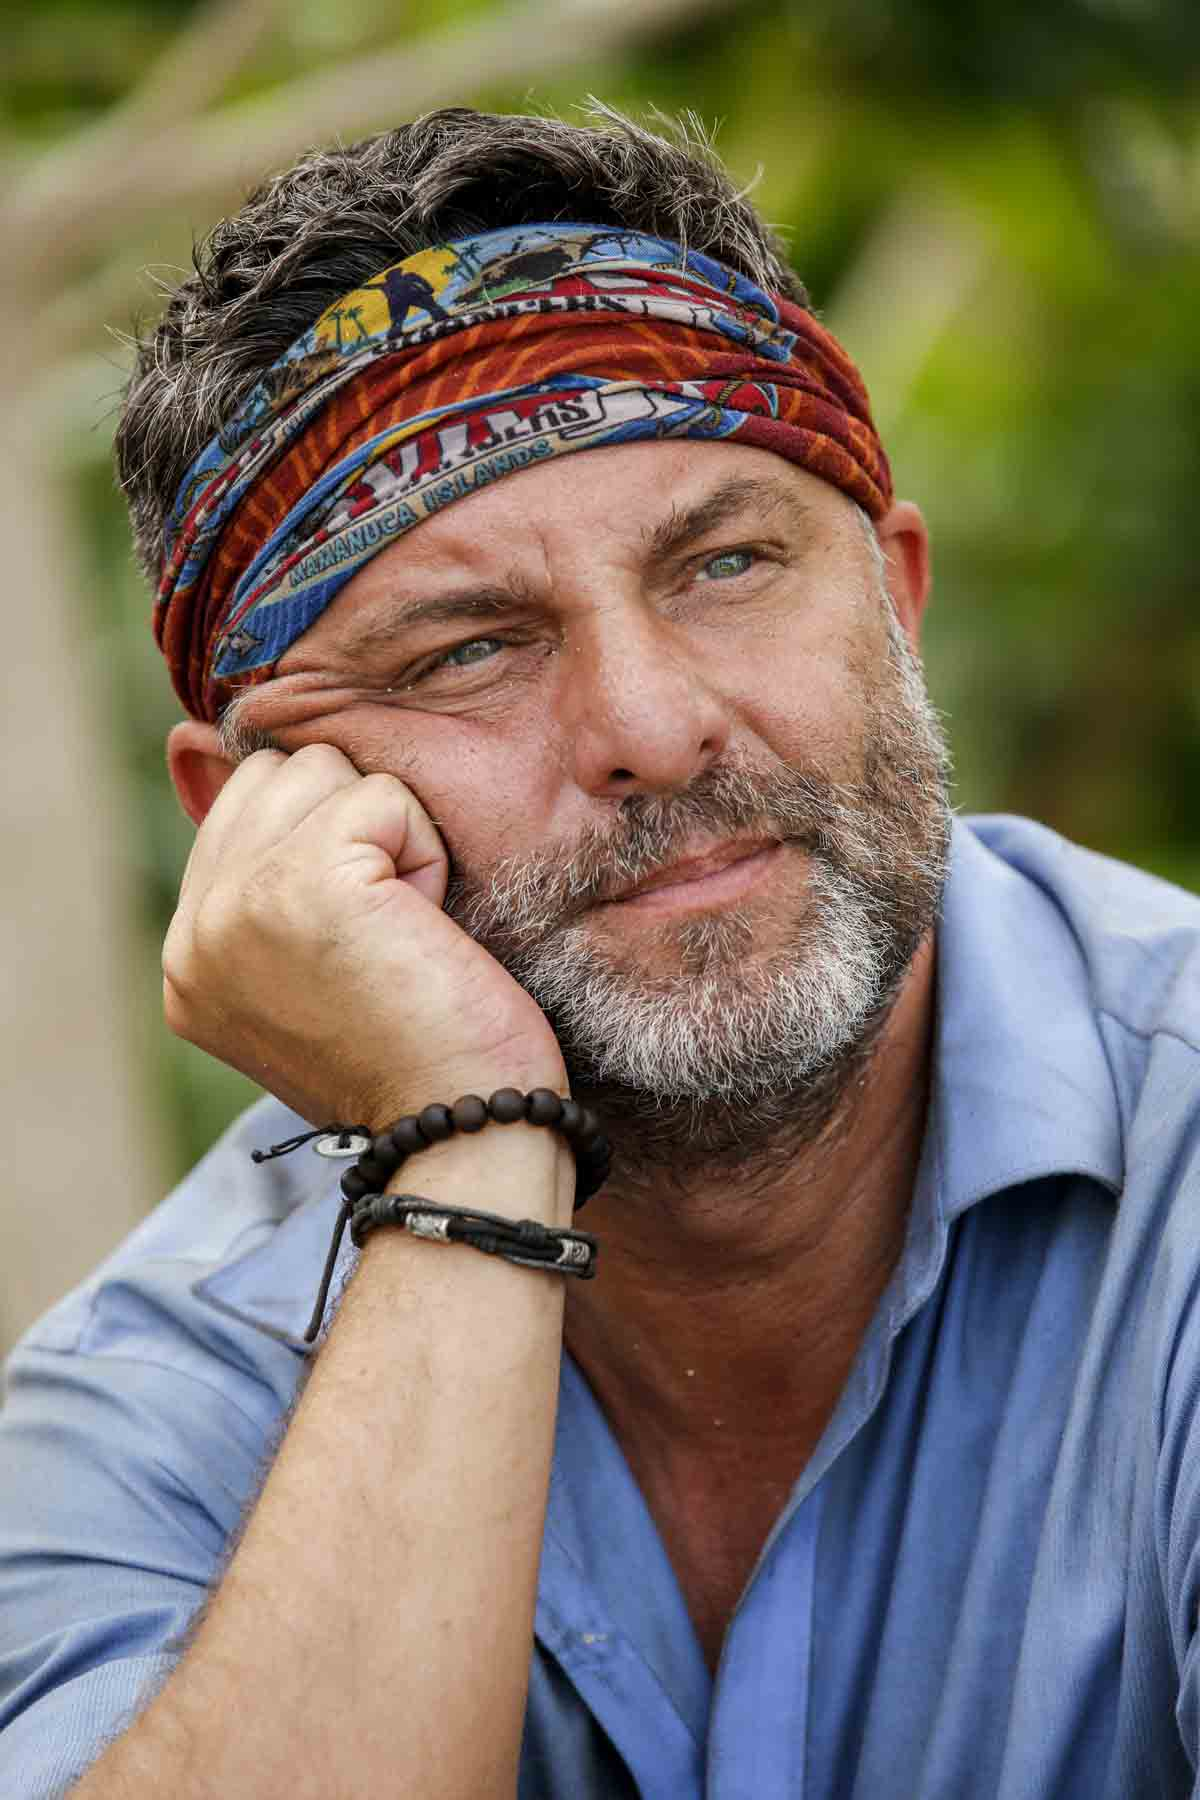 jeff varner s former employer defends decision to fire him